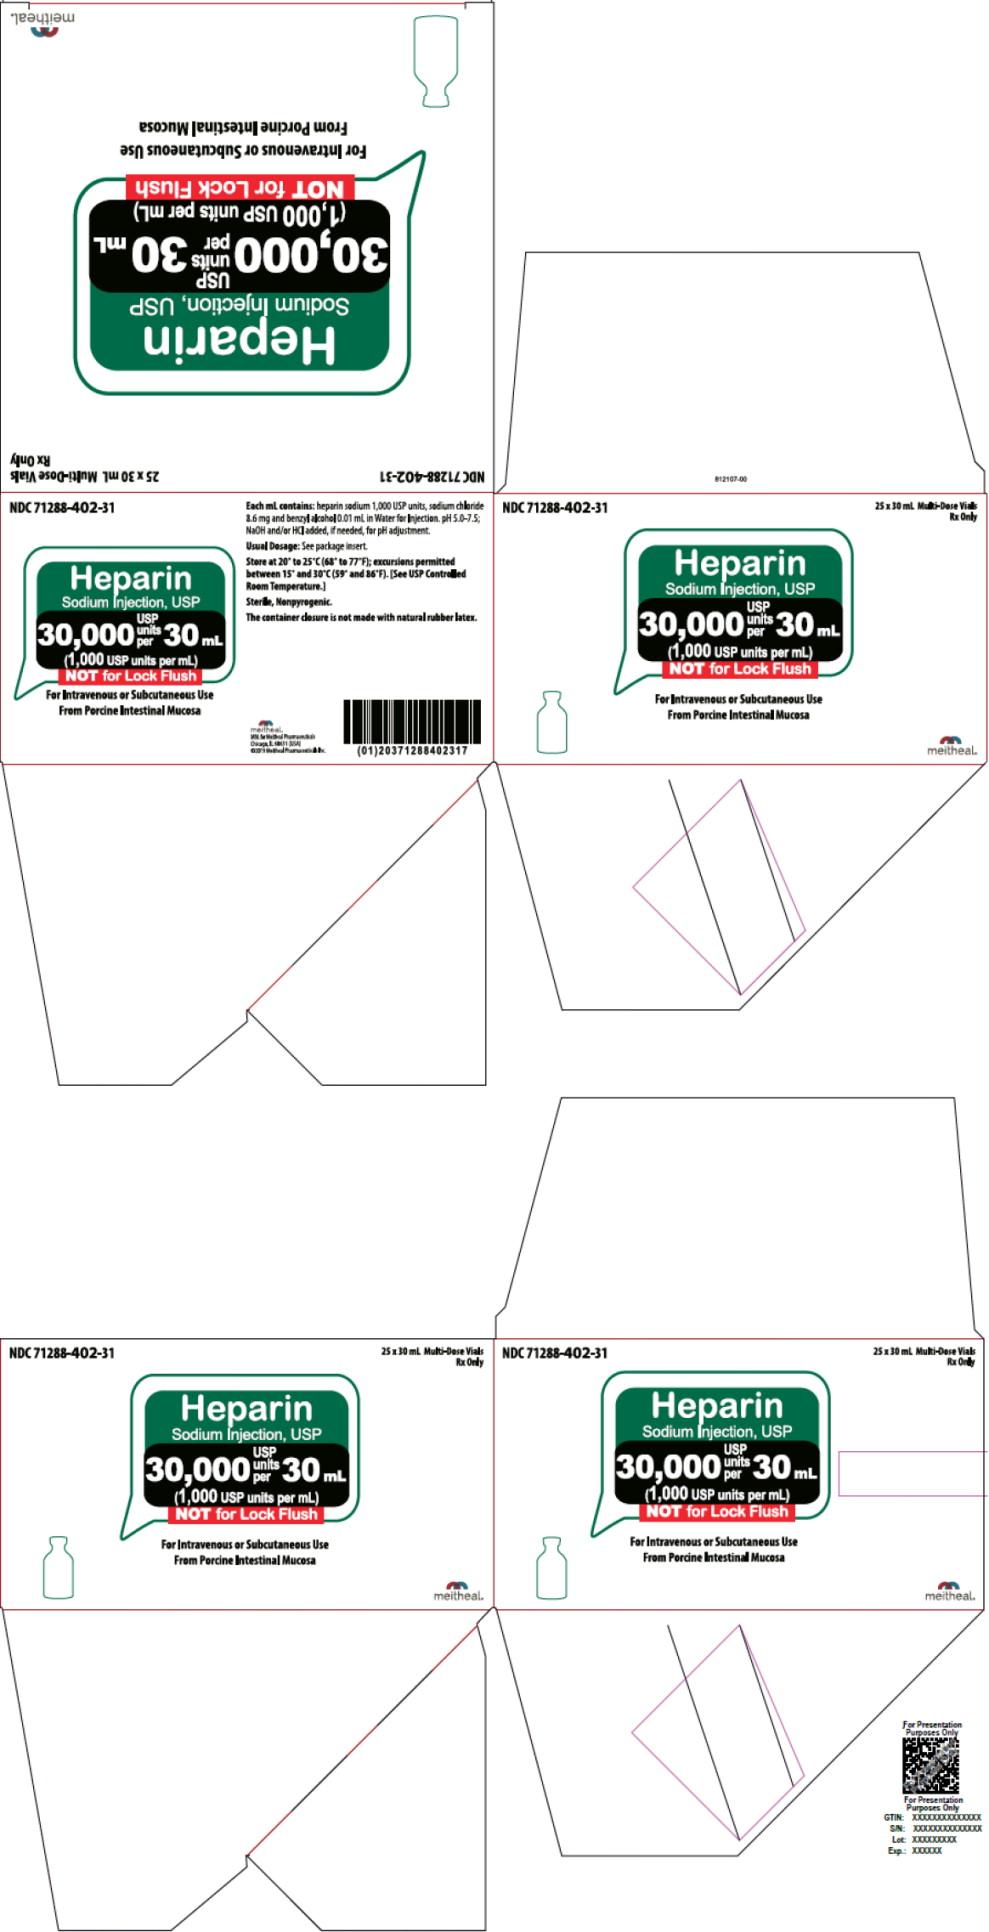 Principal Display Panel – Heparin Sodium Injection, USP 30,000 USP Carton